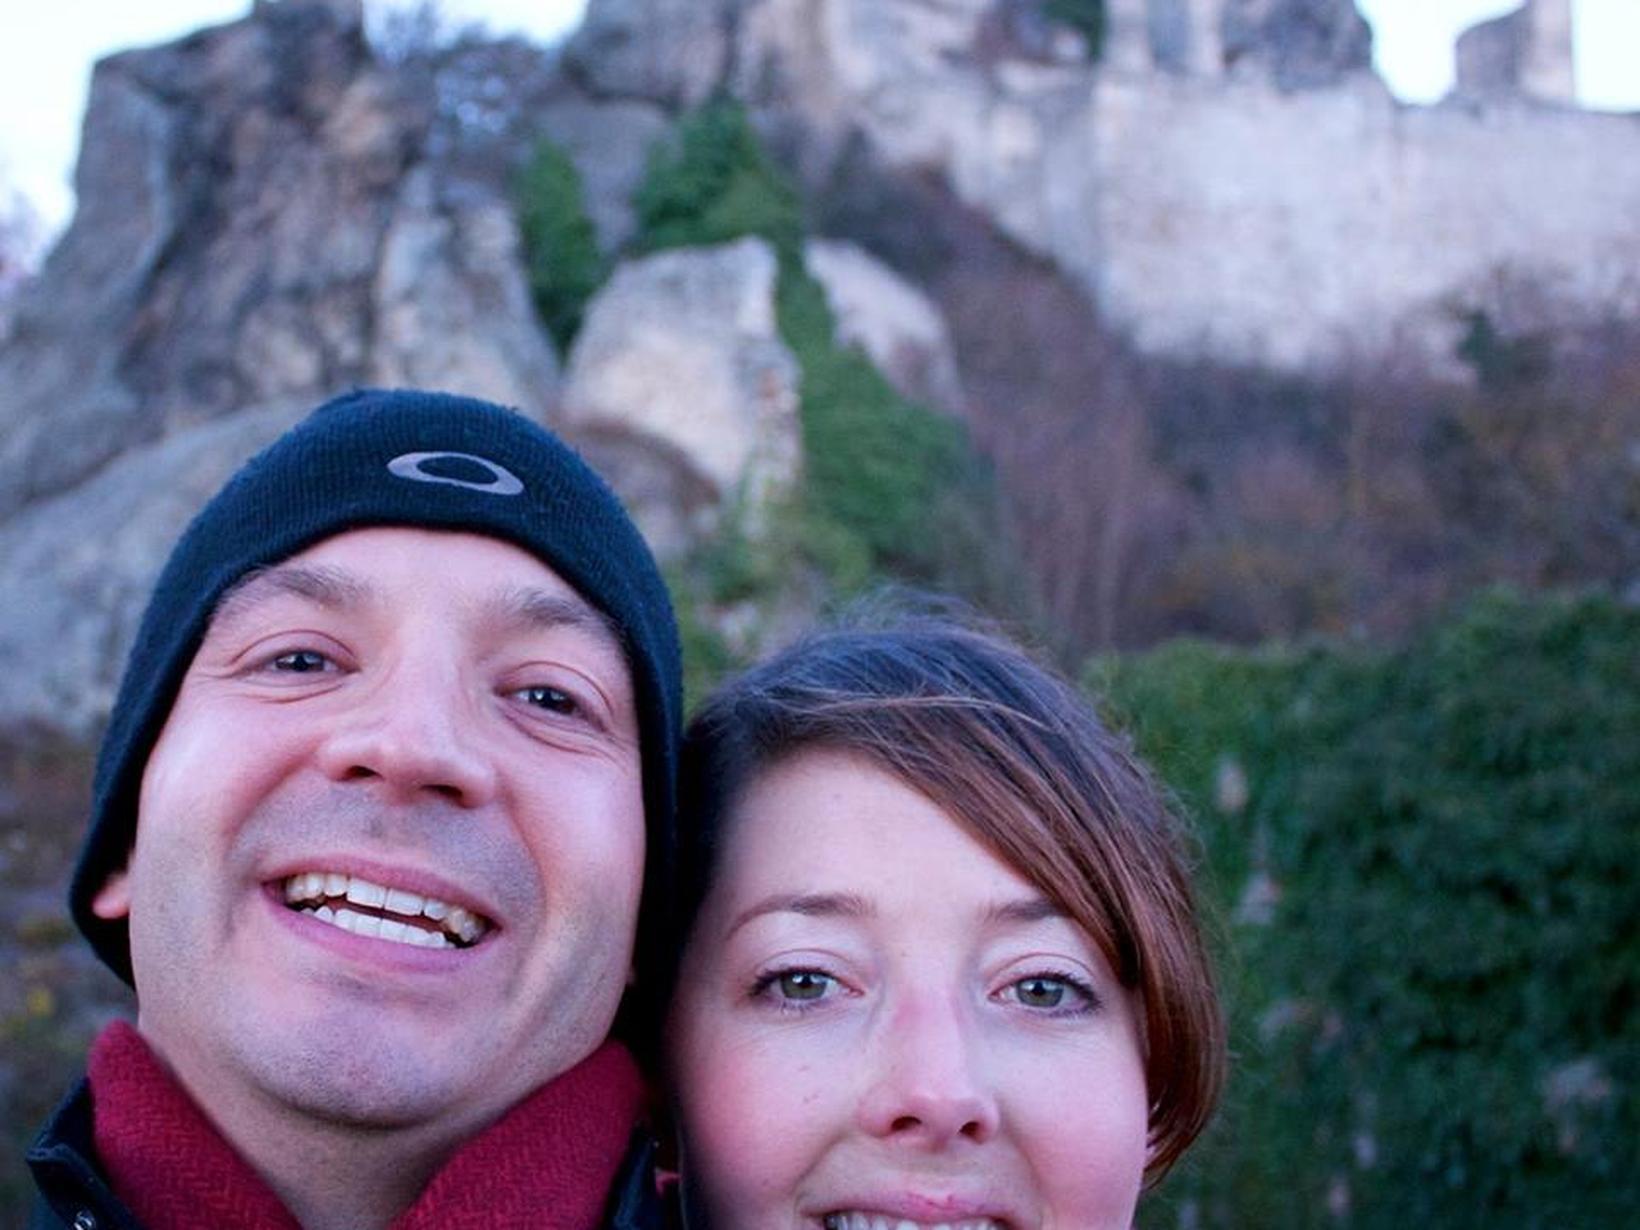 Nicholas & Jillian from Abu Dhabi, United Arab Emirates